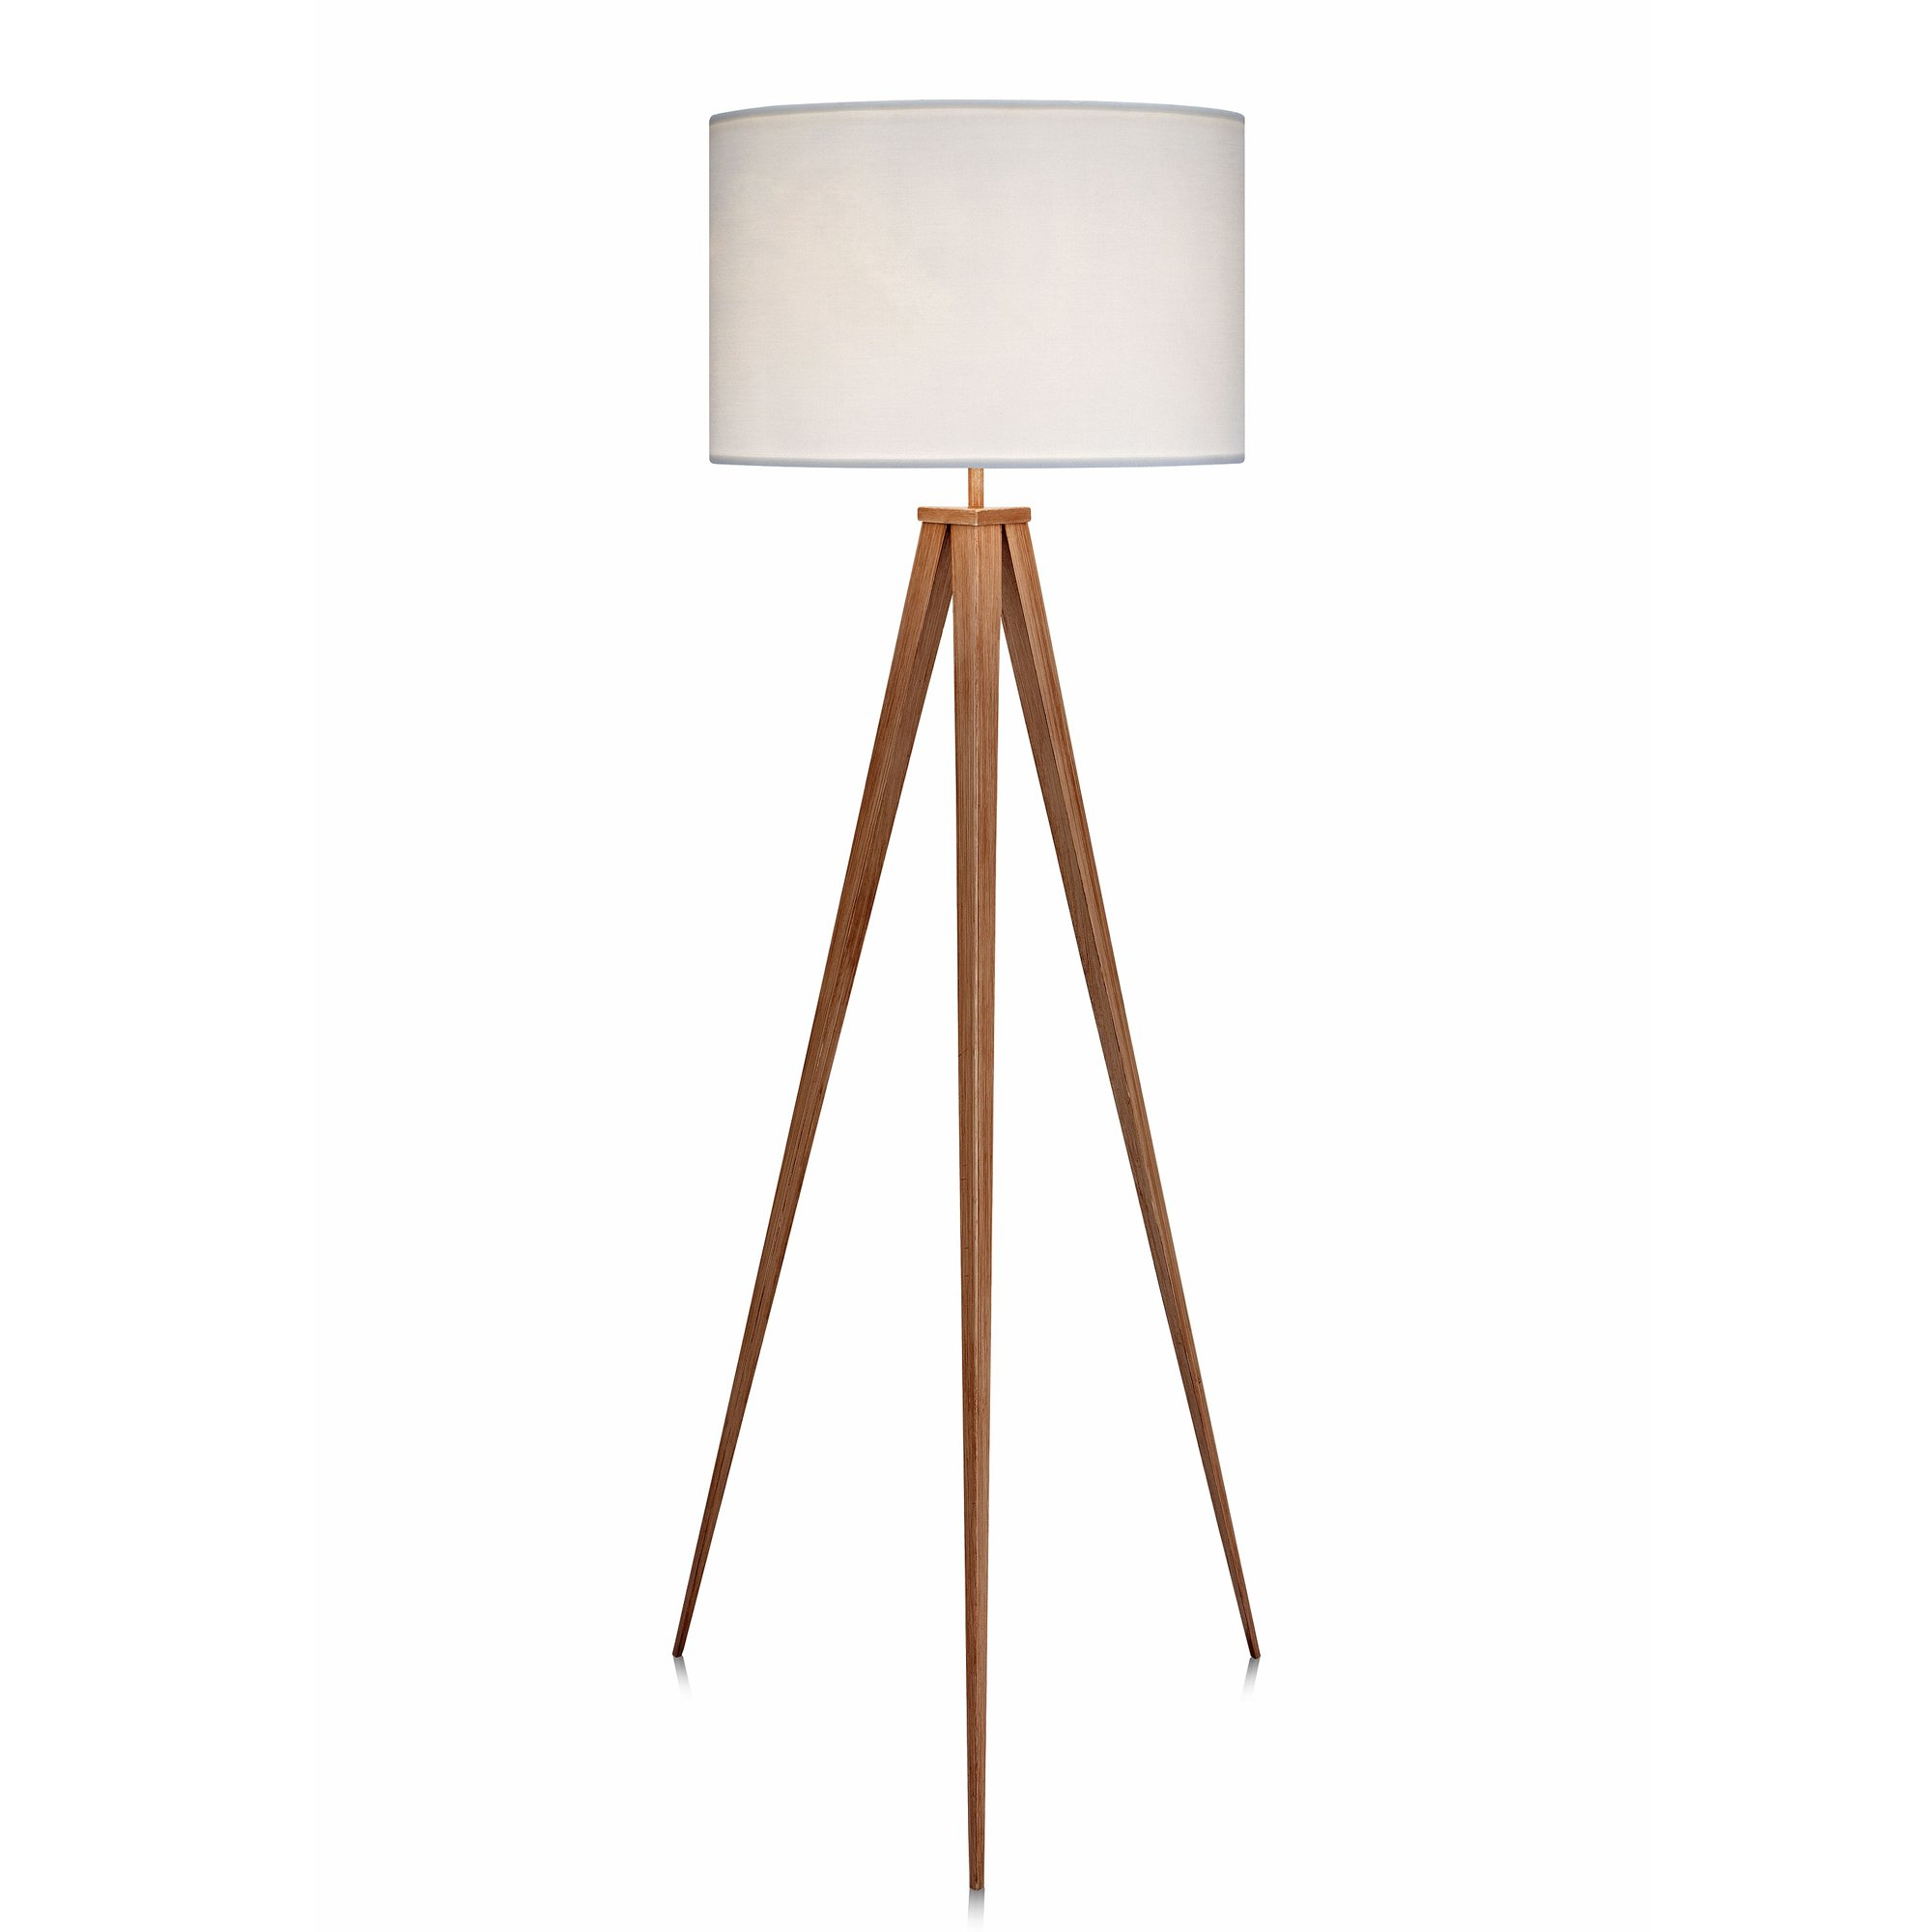 Versanora VN-L00007 Romanza Tripod Floor Lamp, White/Faux wooden leg